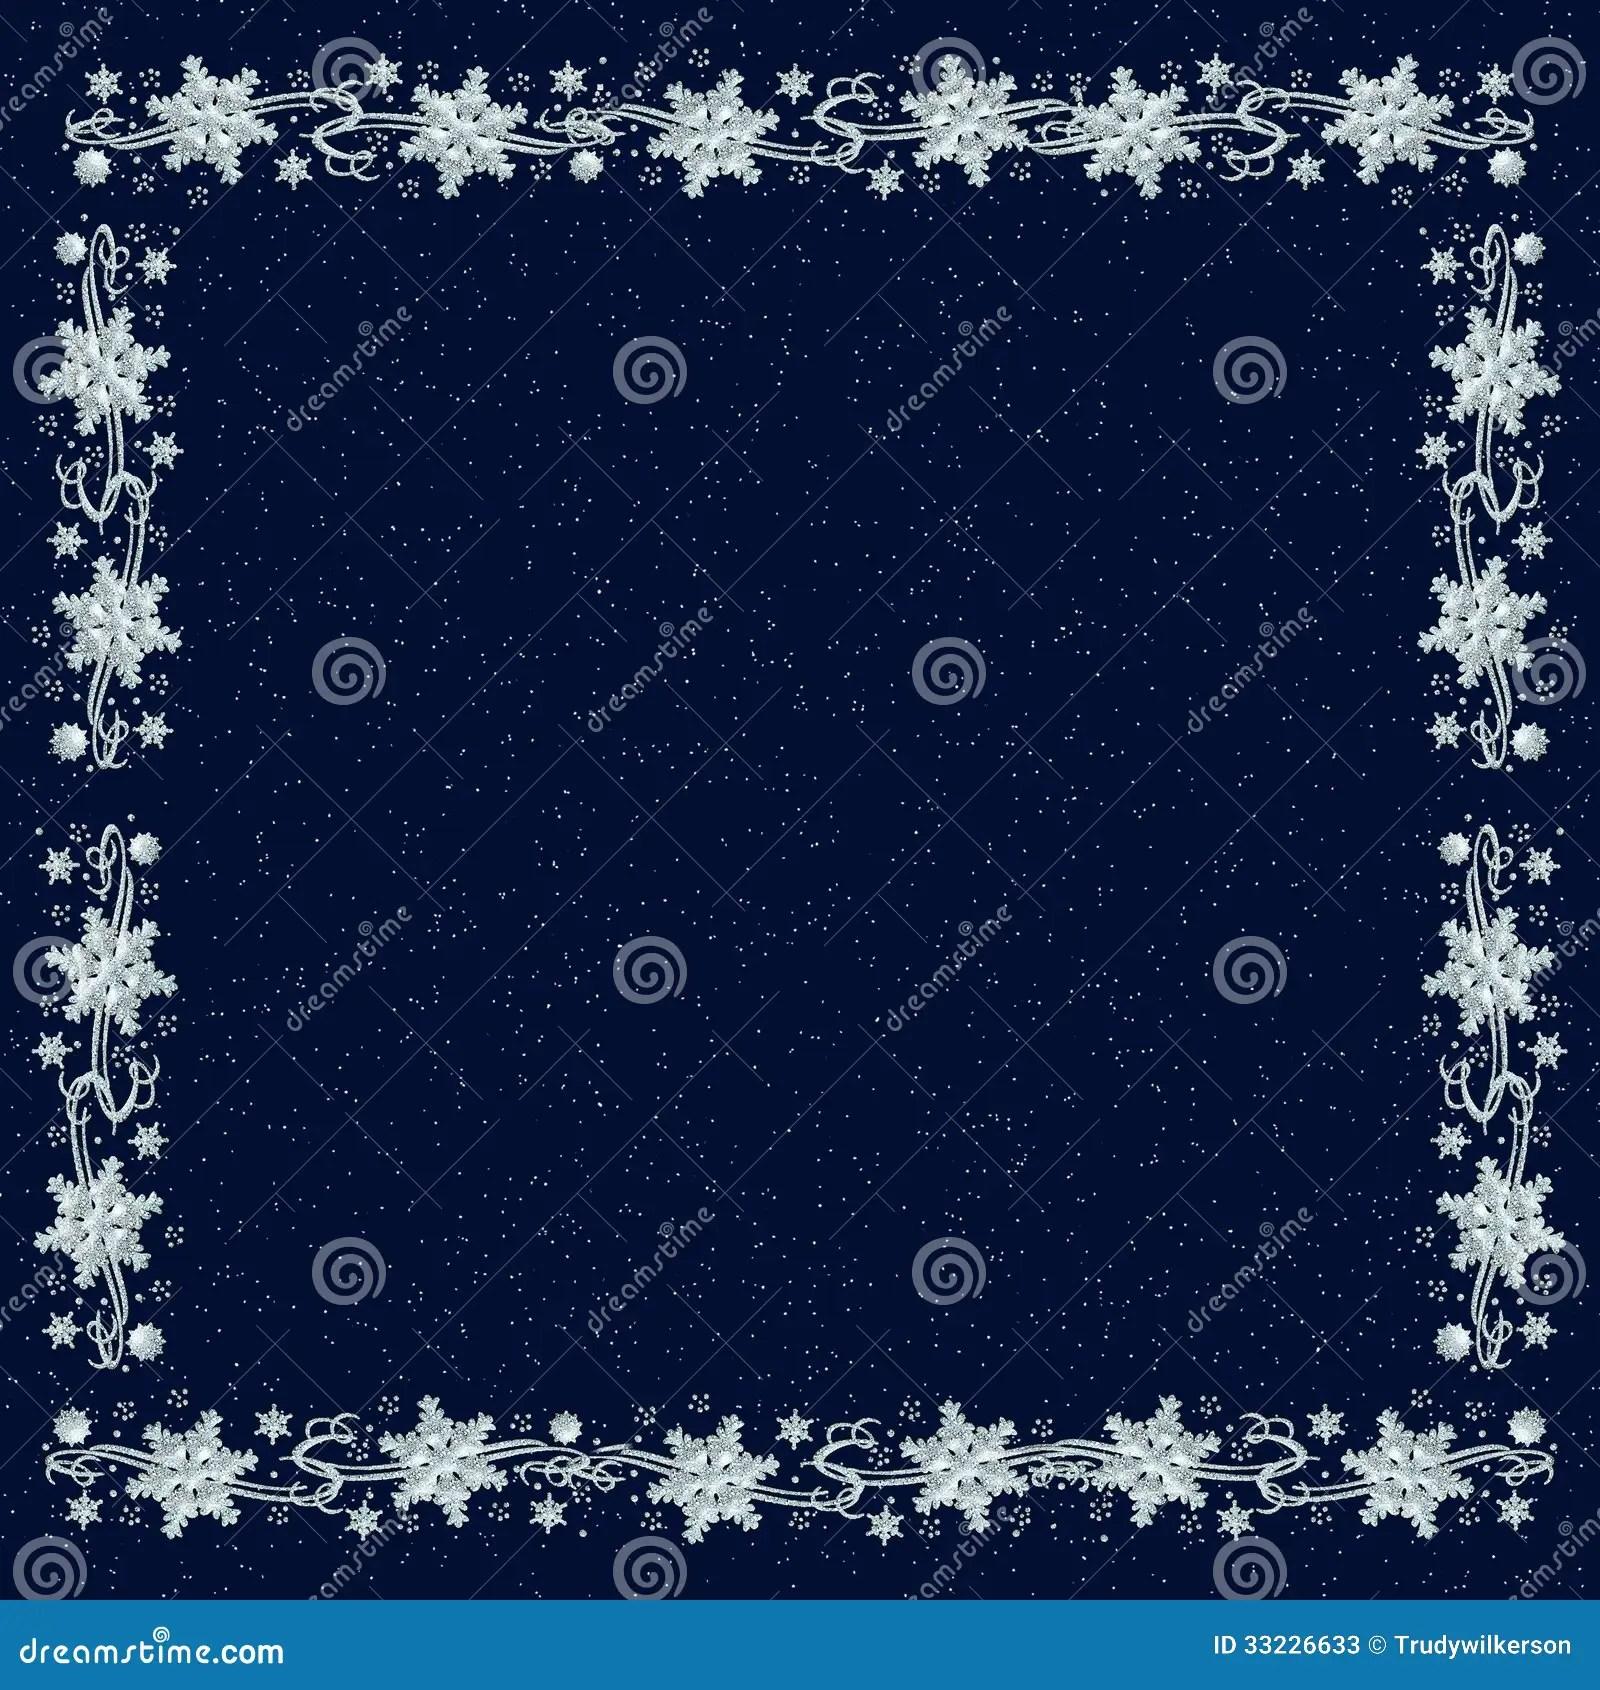 Free Falling Snow Wallpaper Download Snowflake Backgound On Navy Blue Stock Photos Image